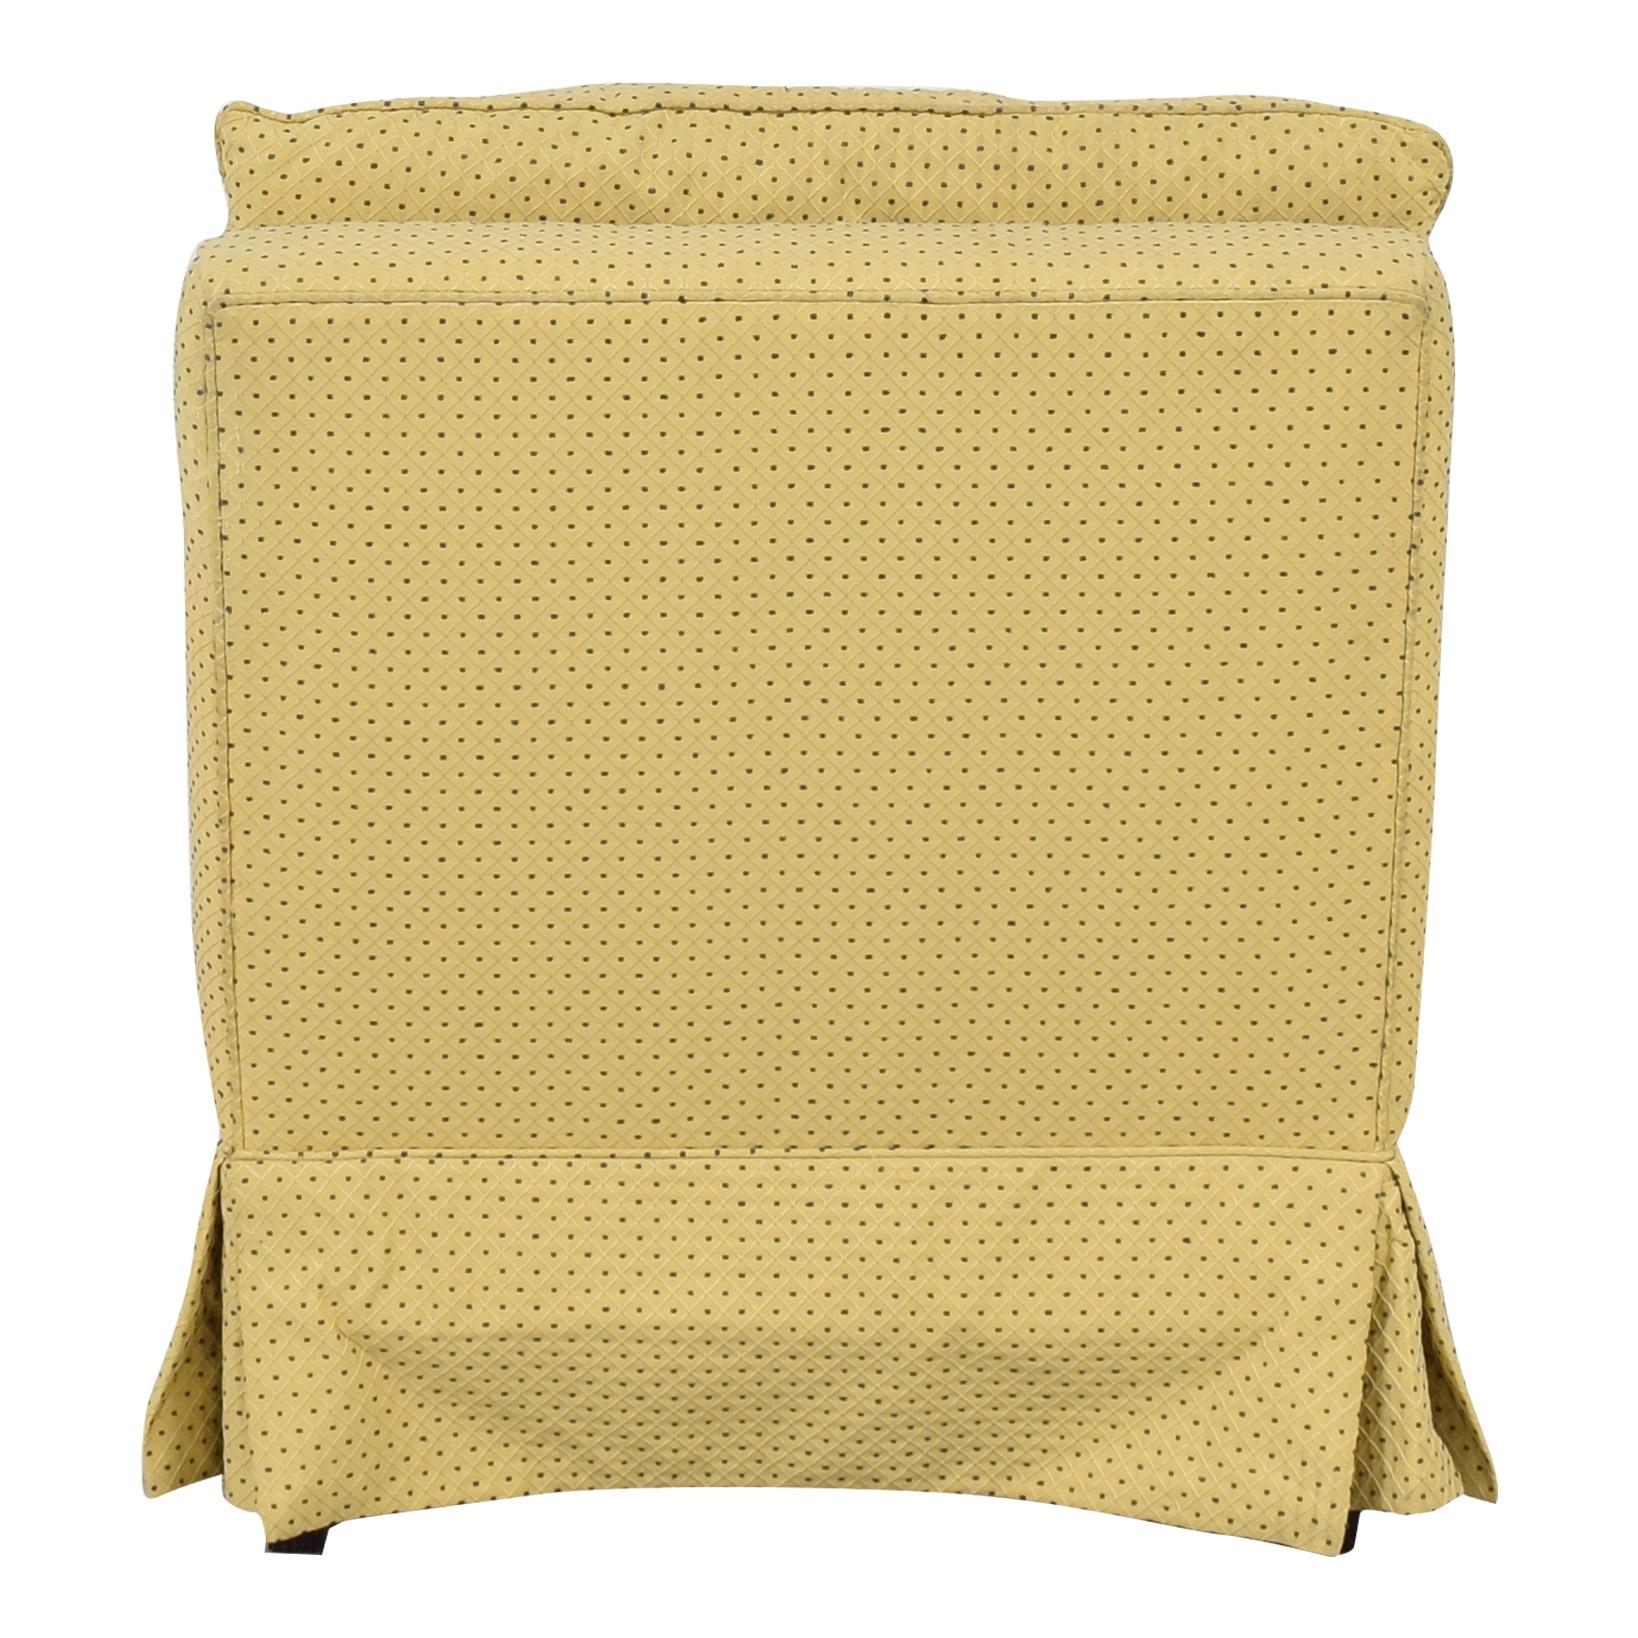 buy Sherrill Furniture Upholstered Chair Sherrill Furniture